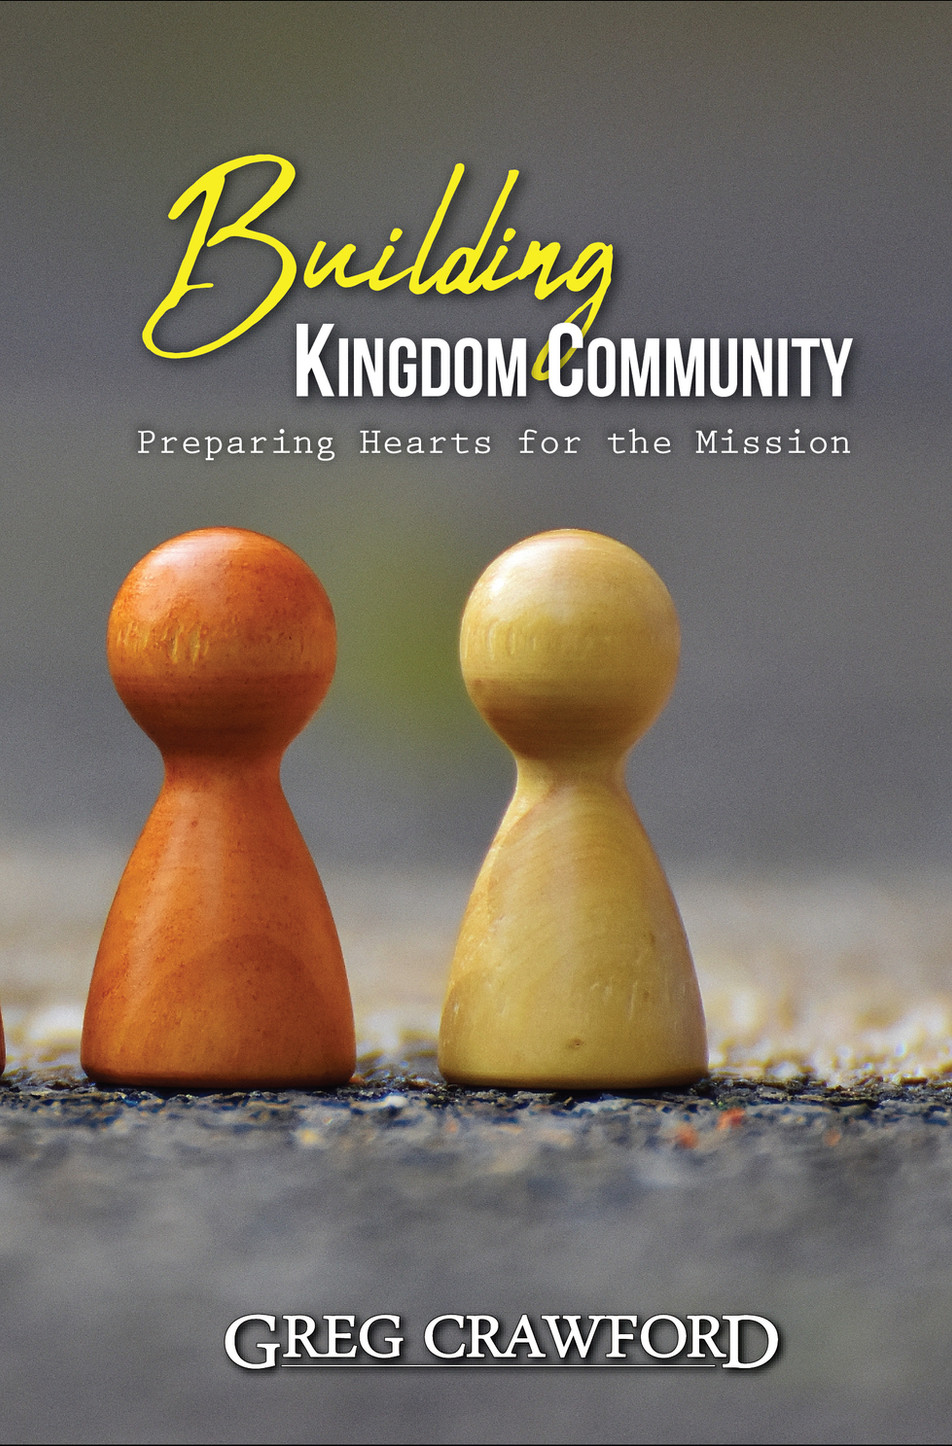 kingdomcommunitybook cover design